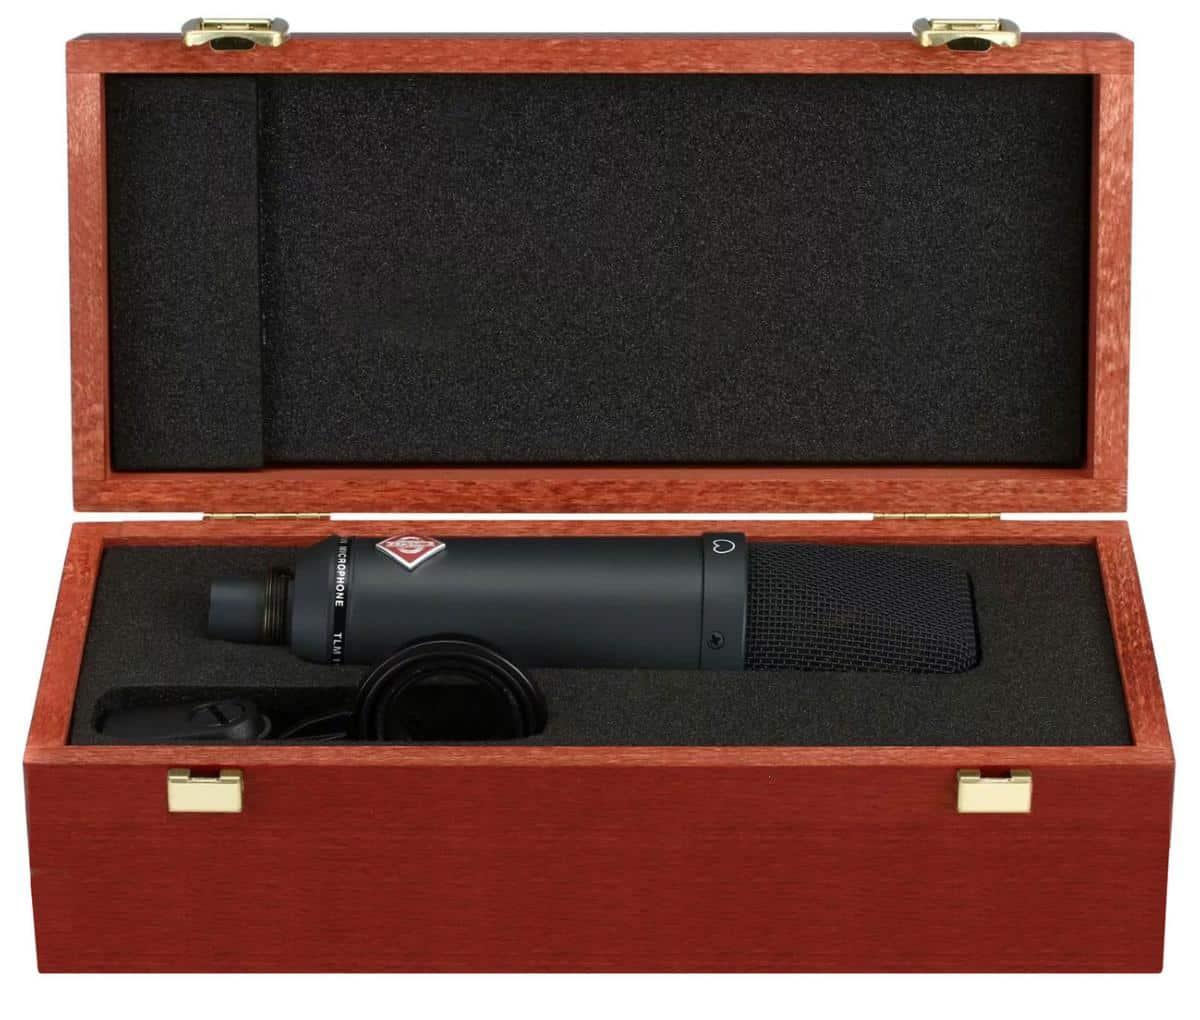 Le microphone à condensateur Neumann TLM 193